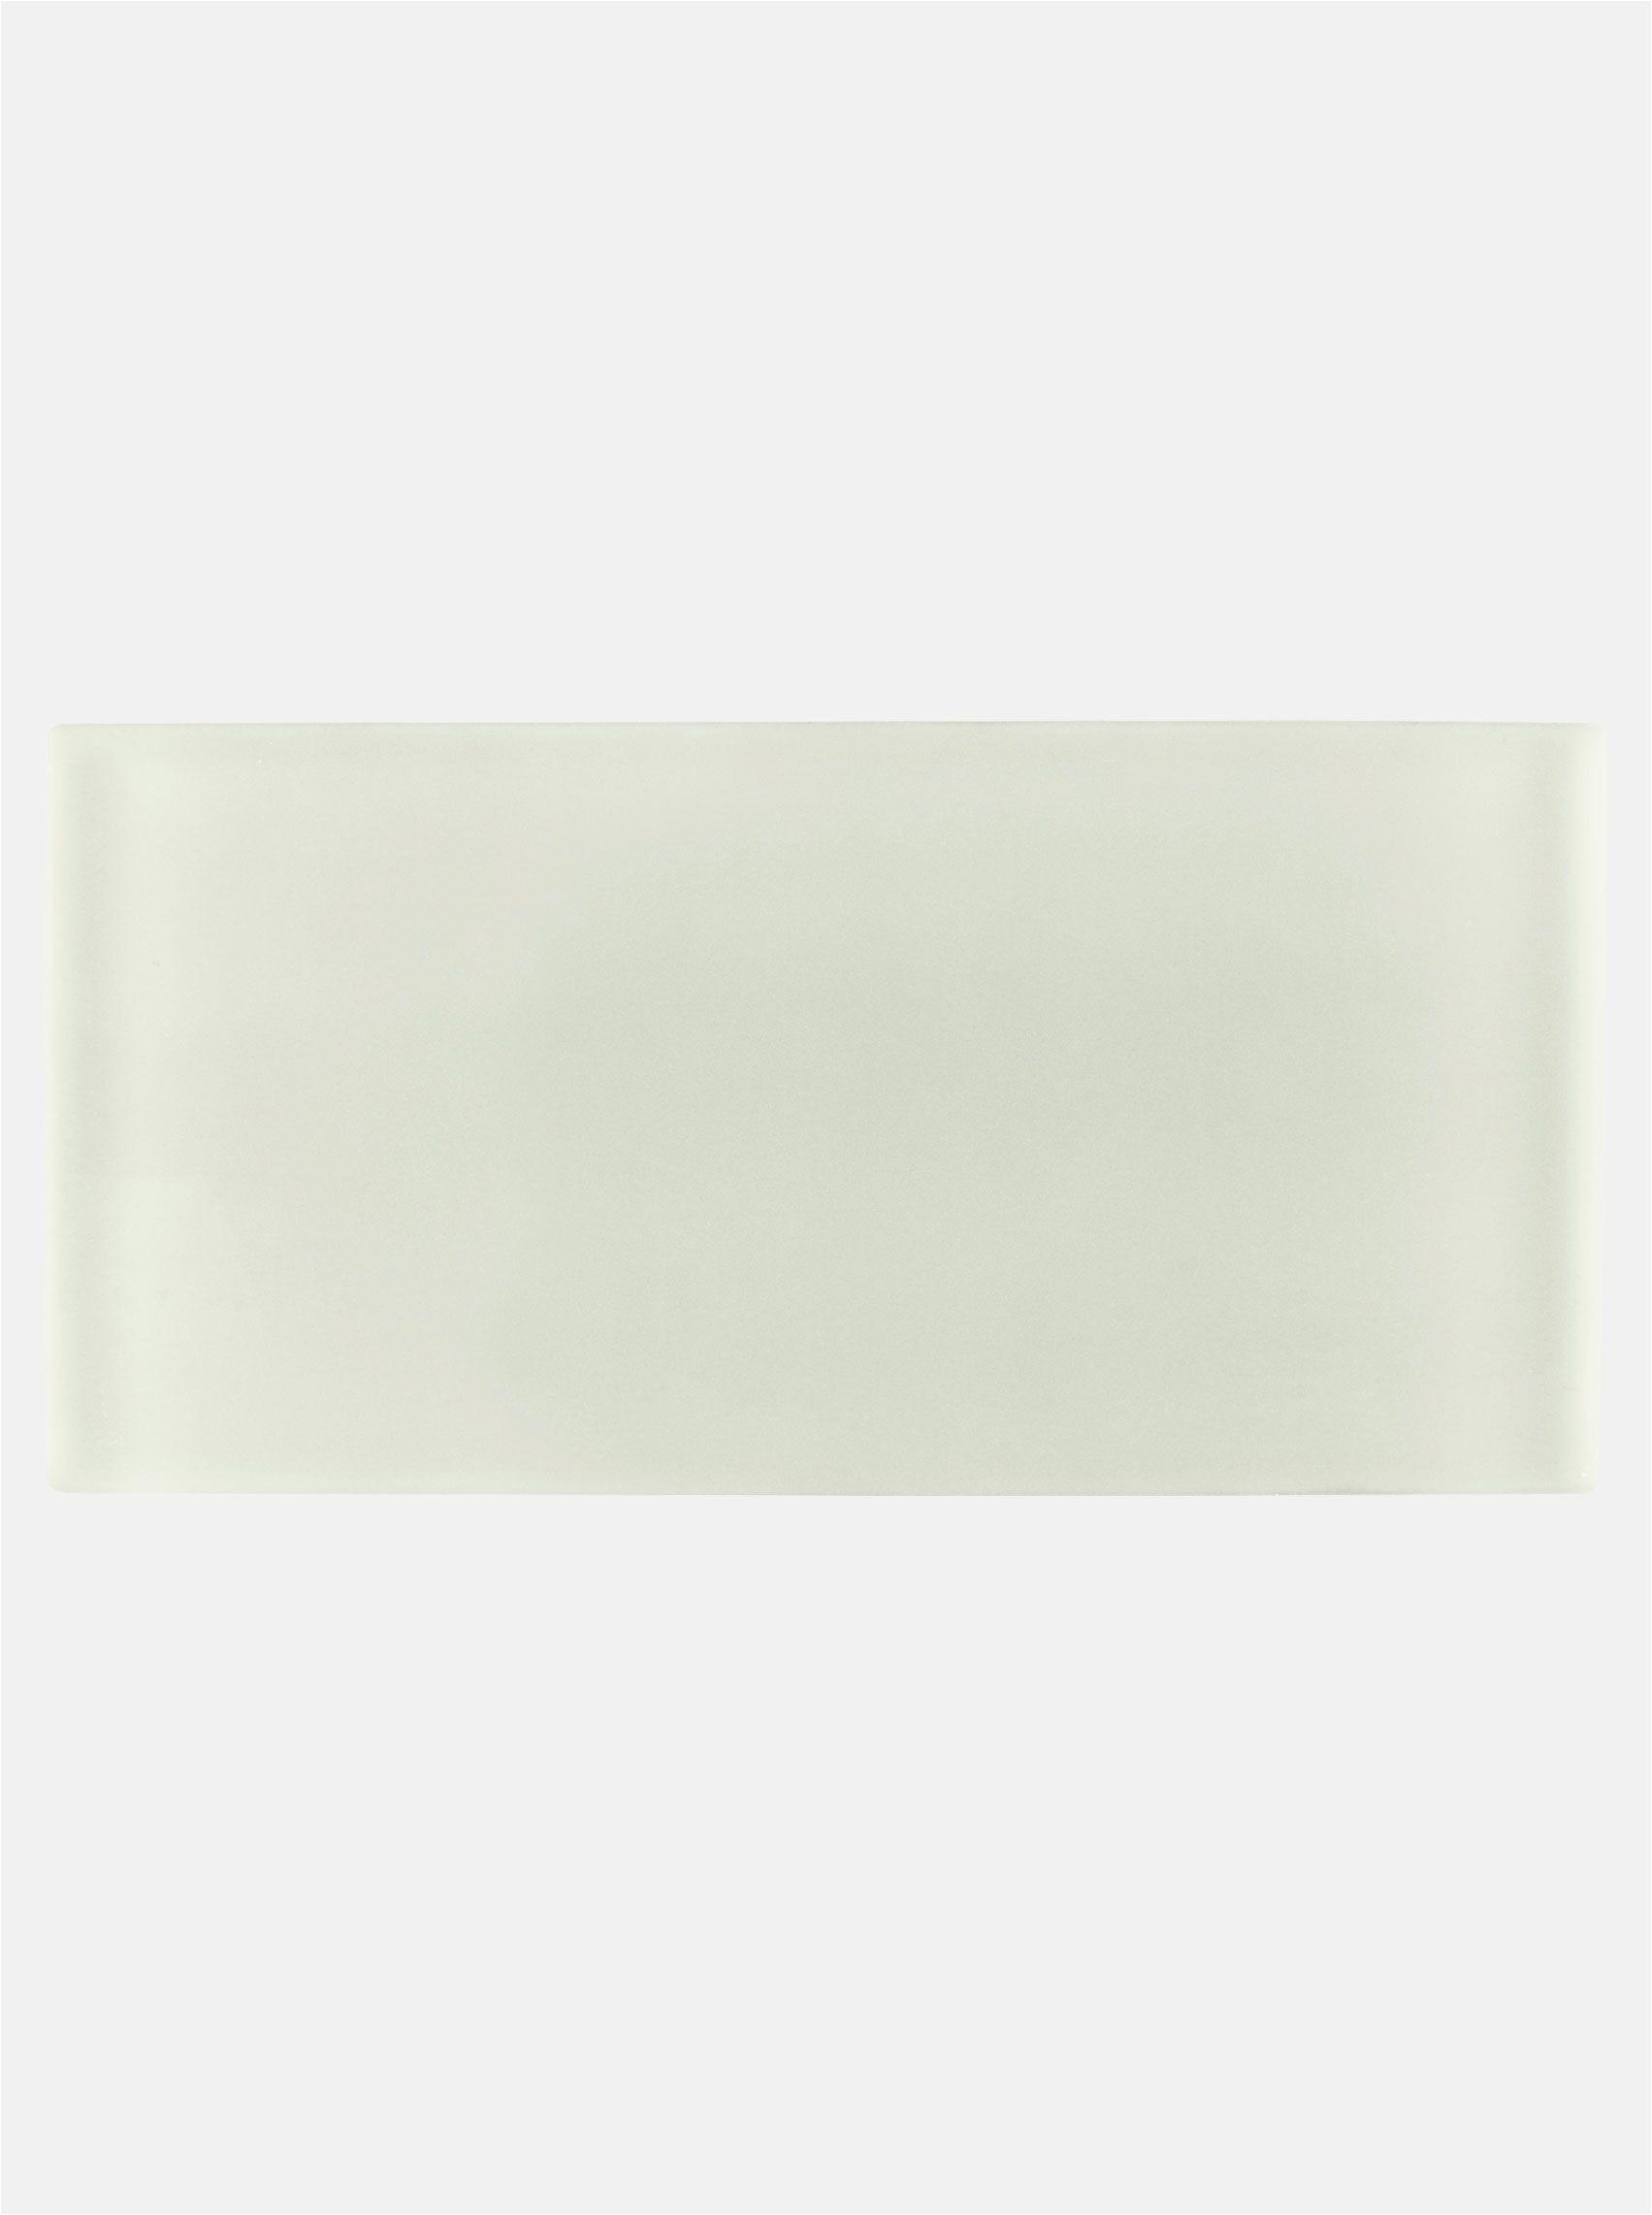 Madison Park Signature Marshmallow Bath Rug byzantine Ice 7 5×15 In 2020